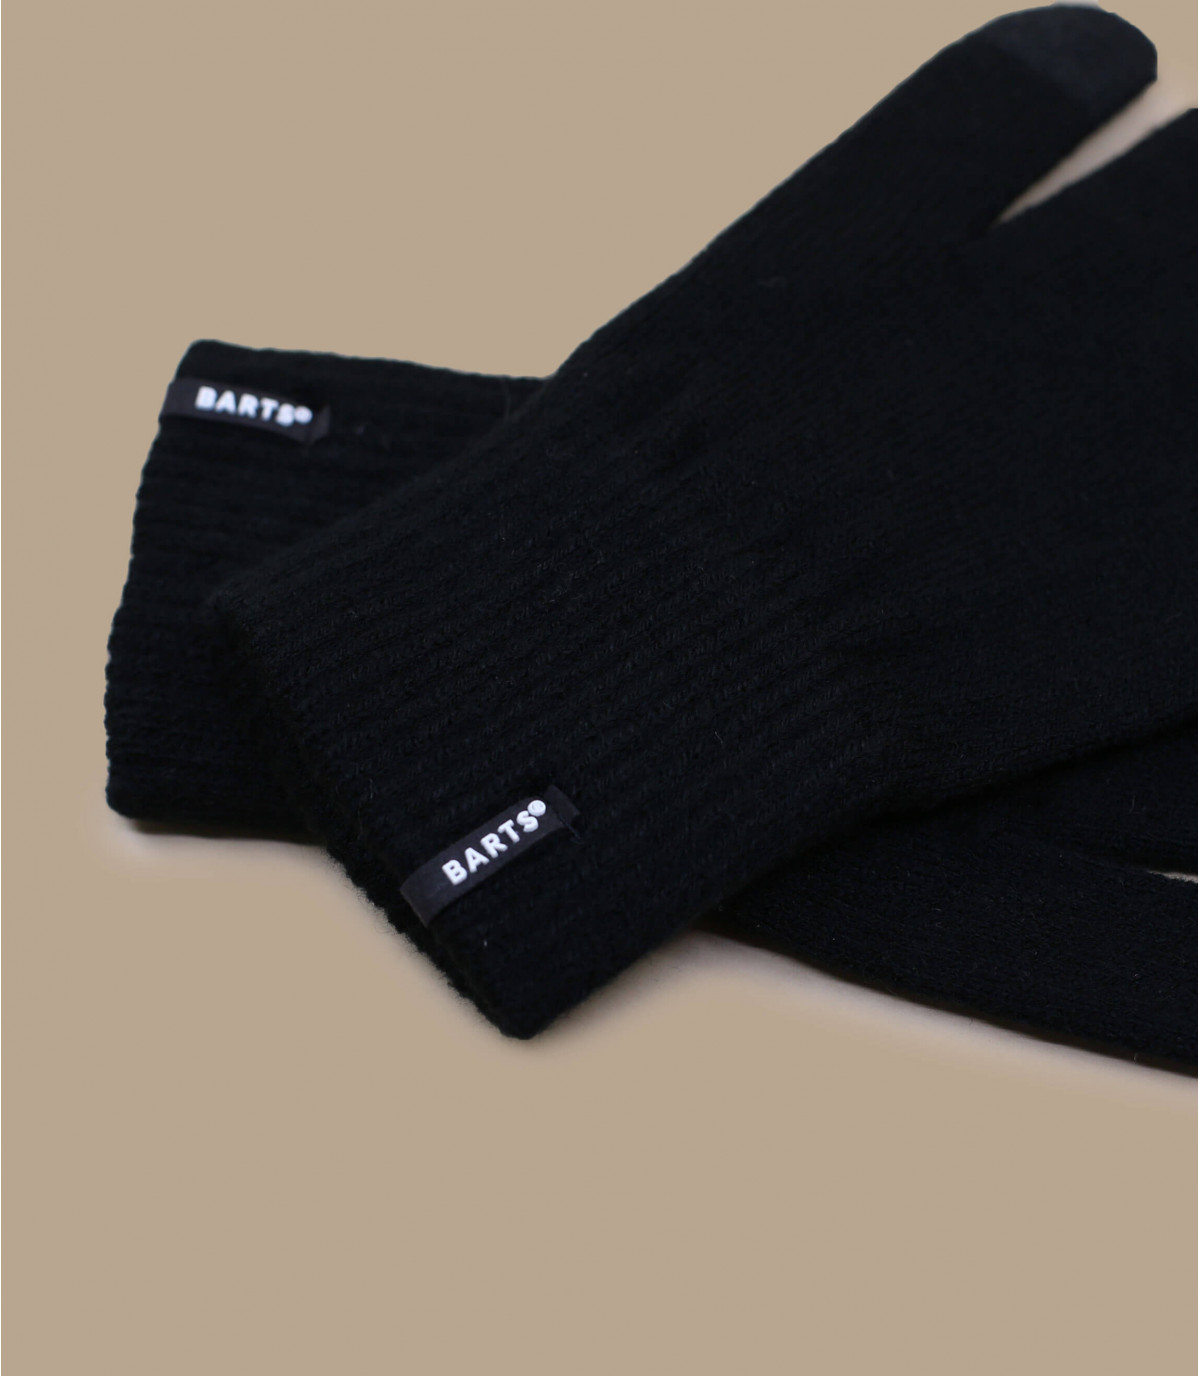 Details Fine knitted touch handschoenen zwart - afbeeling 2